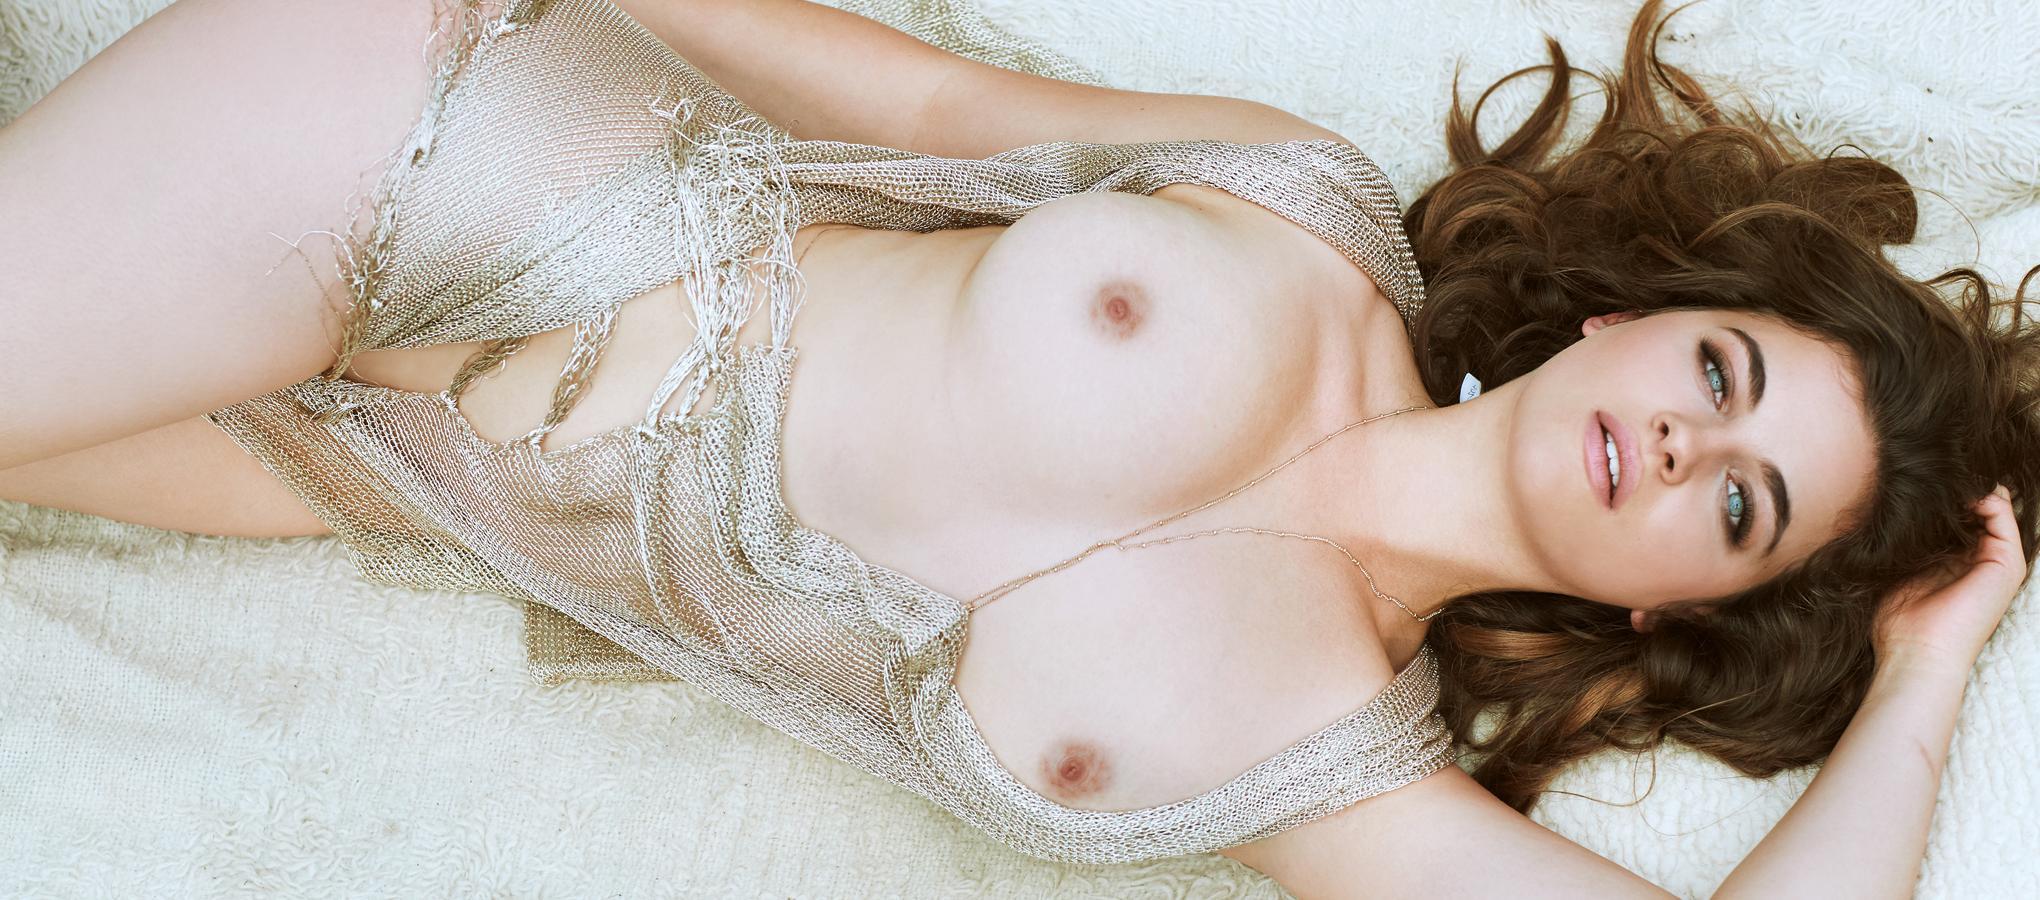 Forcher nackt